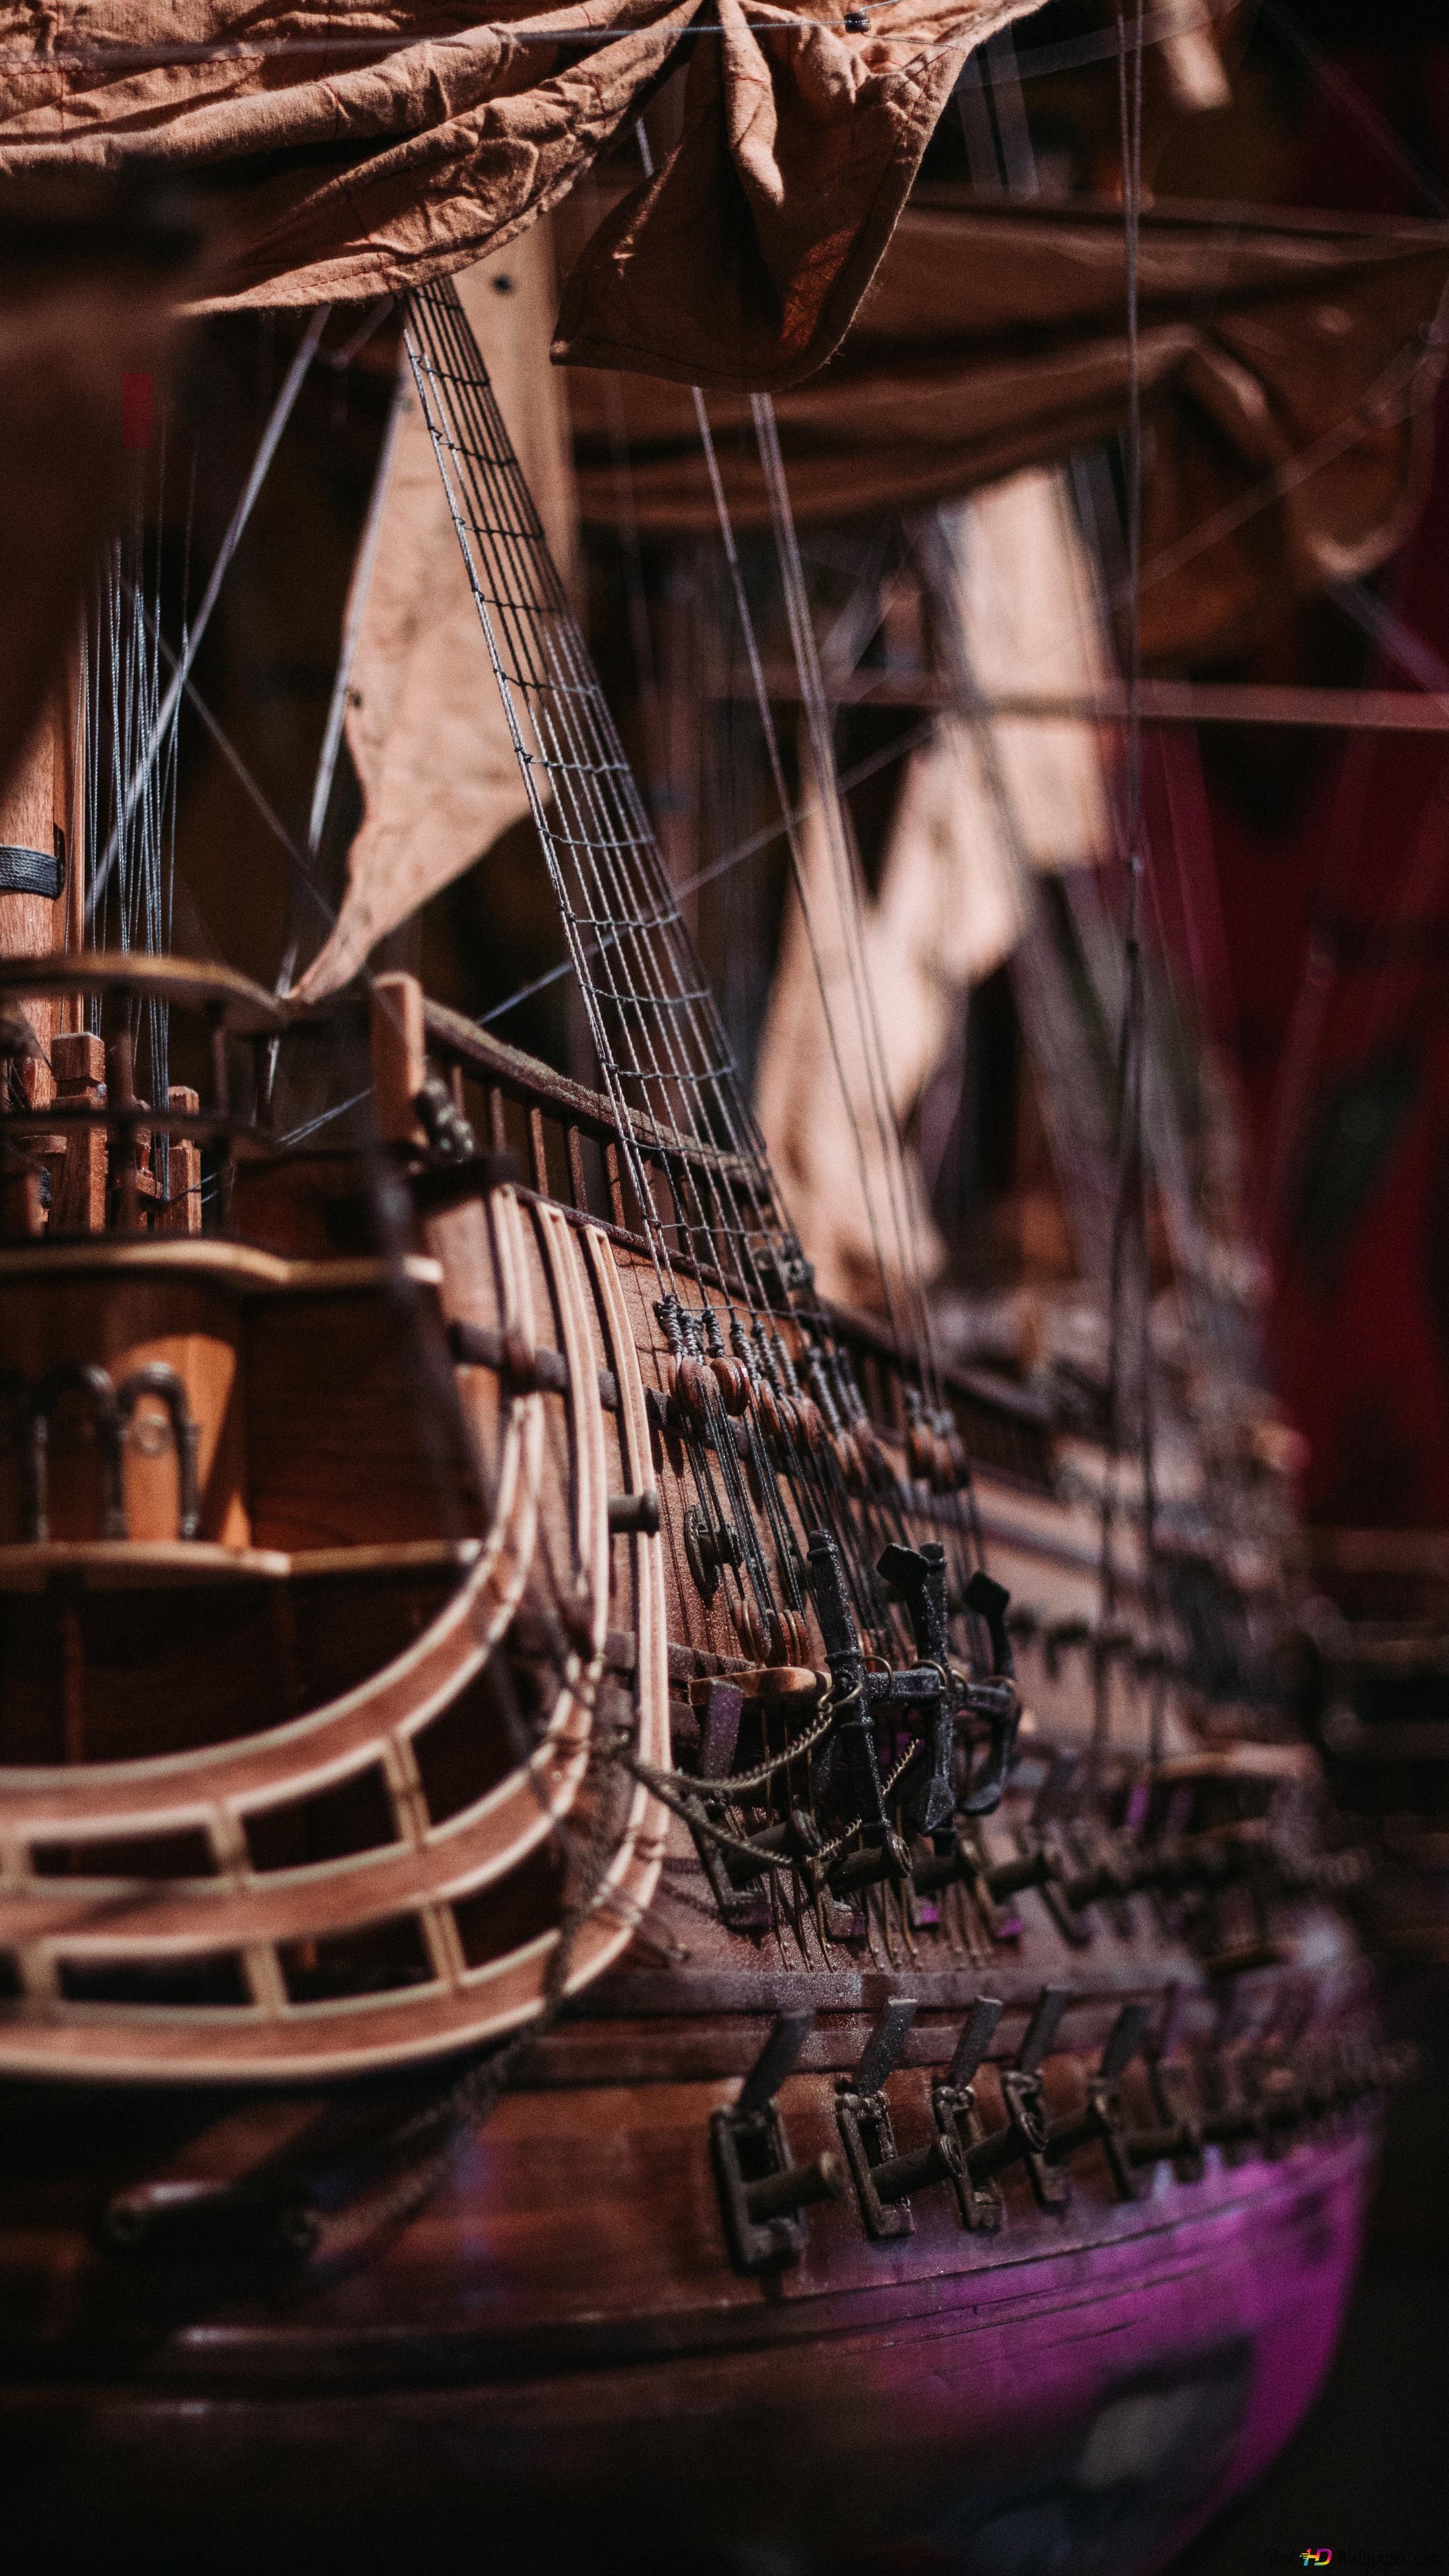 Pirate Ship HD wallpaper download